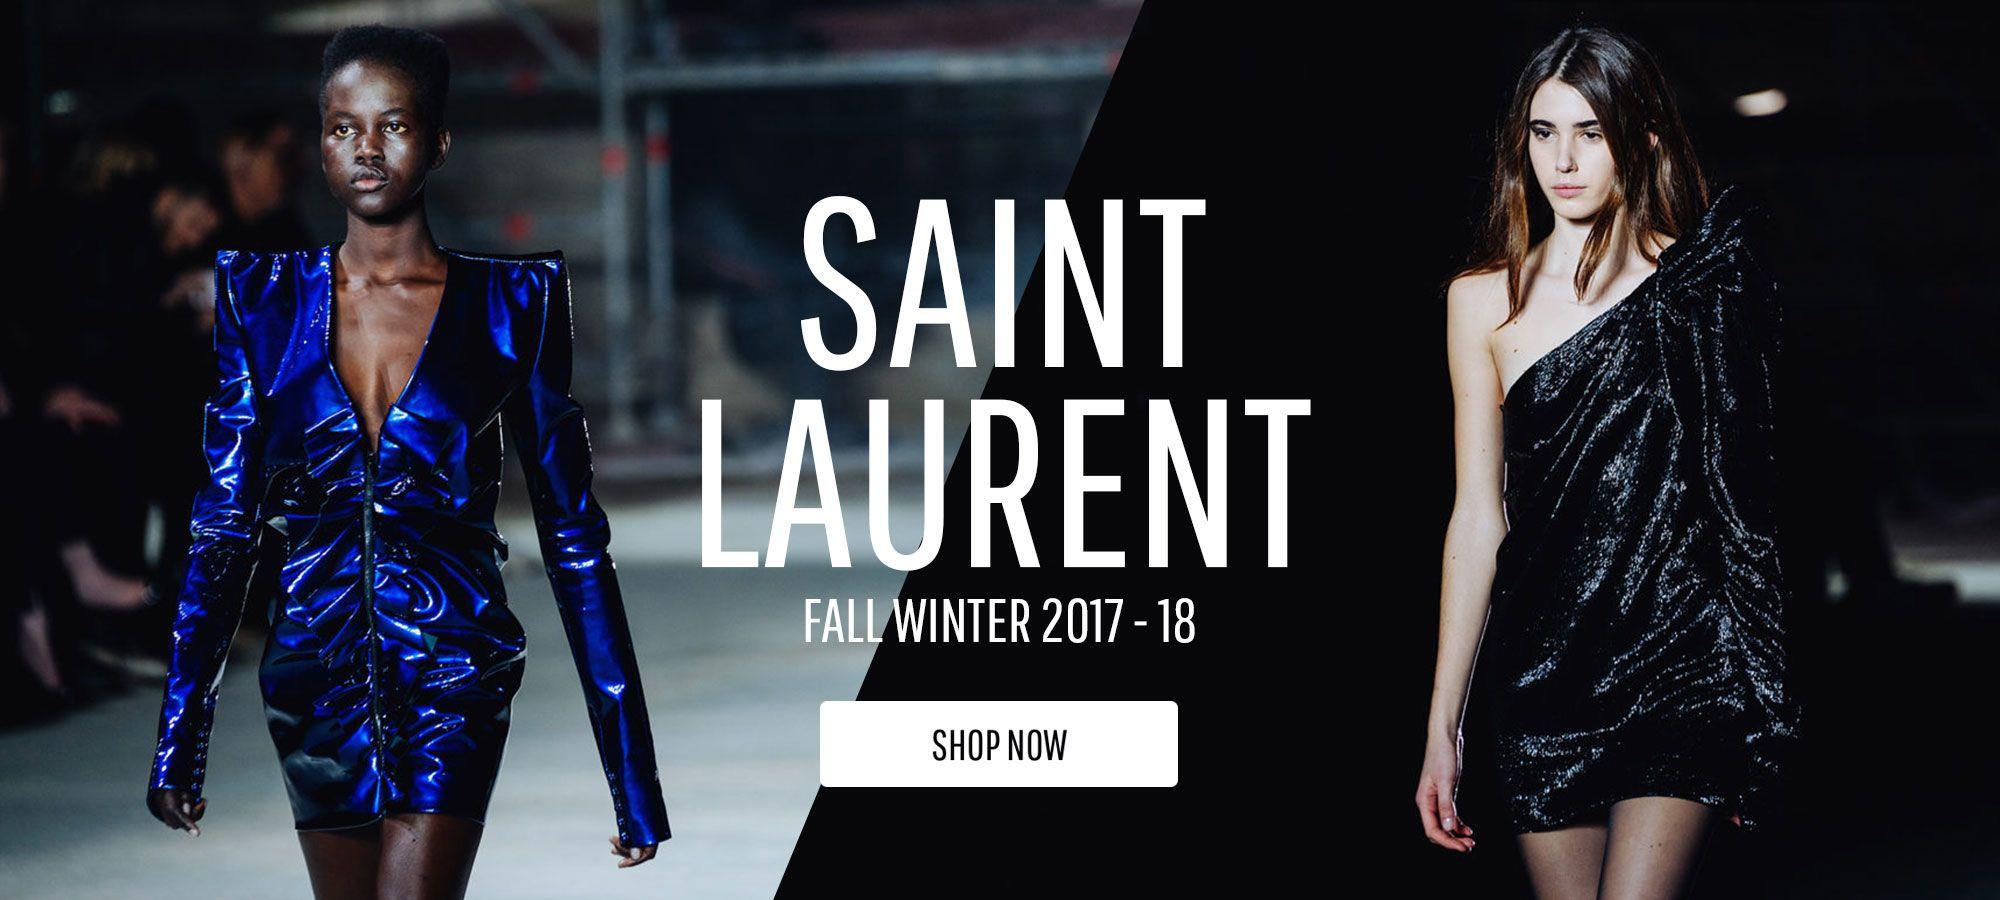 Saint Laurent Women - Fall Winter 2017